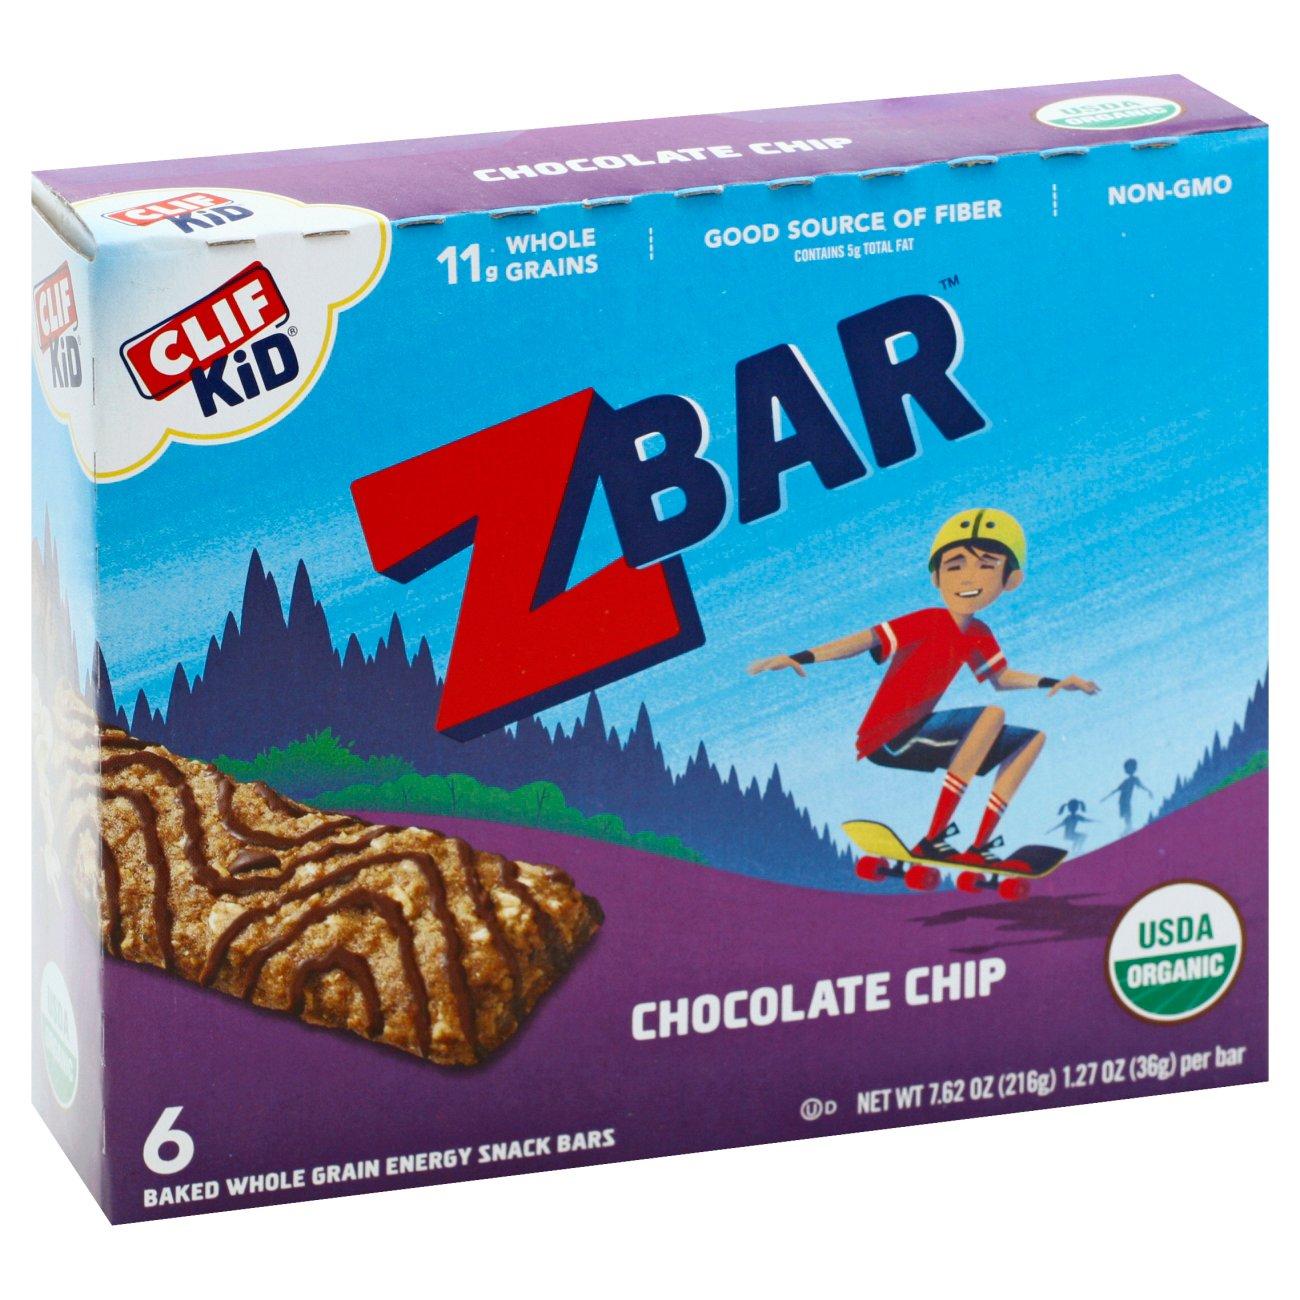 Clif Kid Organic Chocolate Chip Z Bars